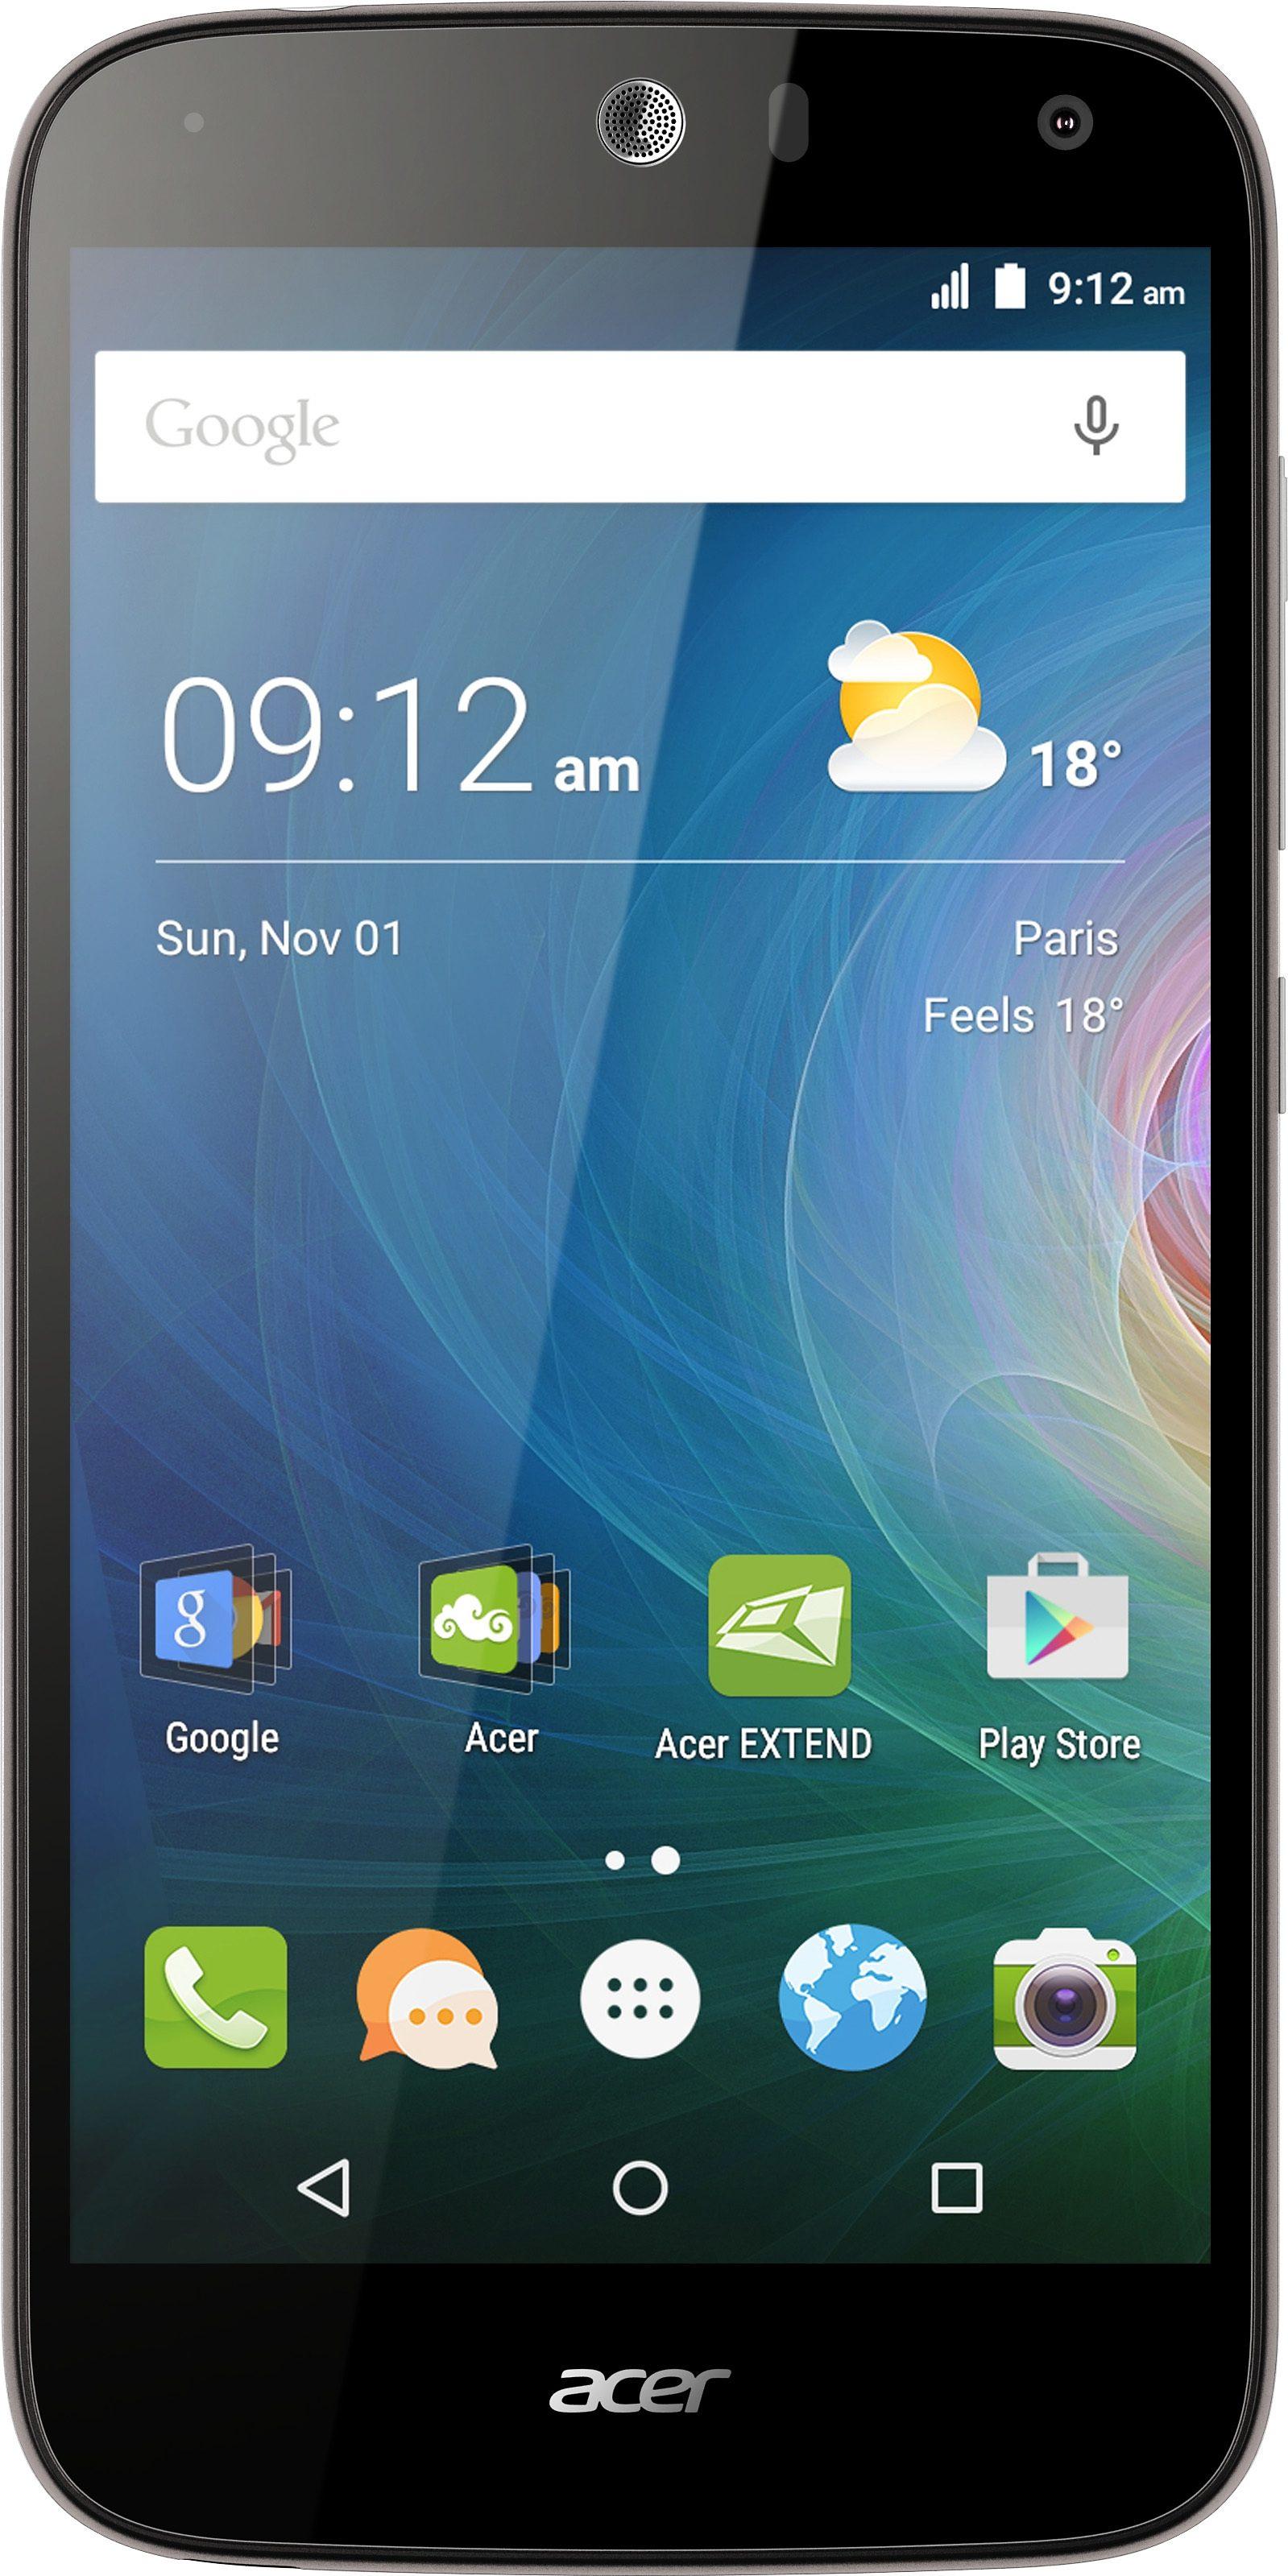 Acer Liquid Z630 Smartphone, 14 cm (5,5 Zoll) Display, LTE (4G), Android 5.1 Lollipop, 8,0 Megapixel